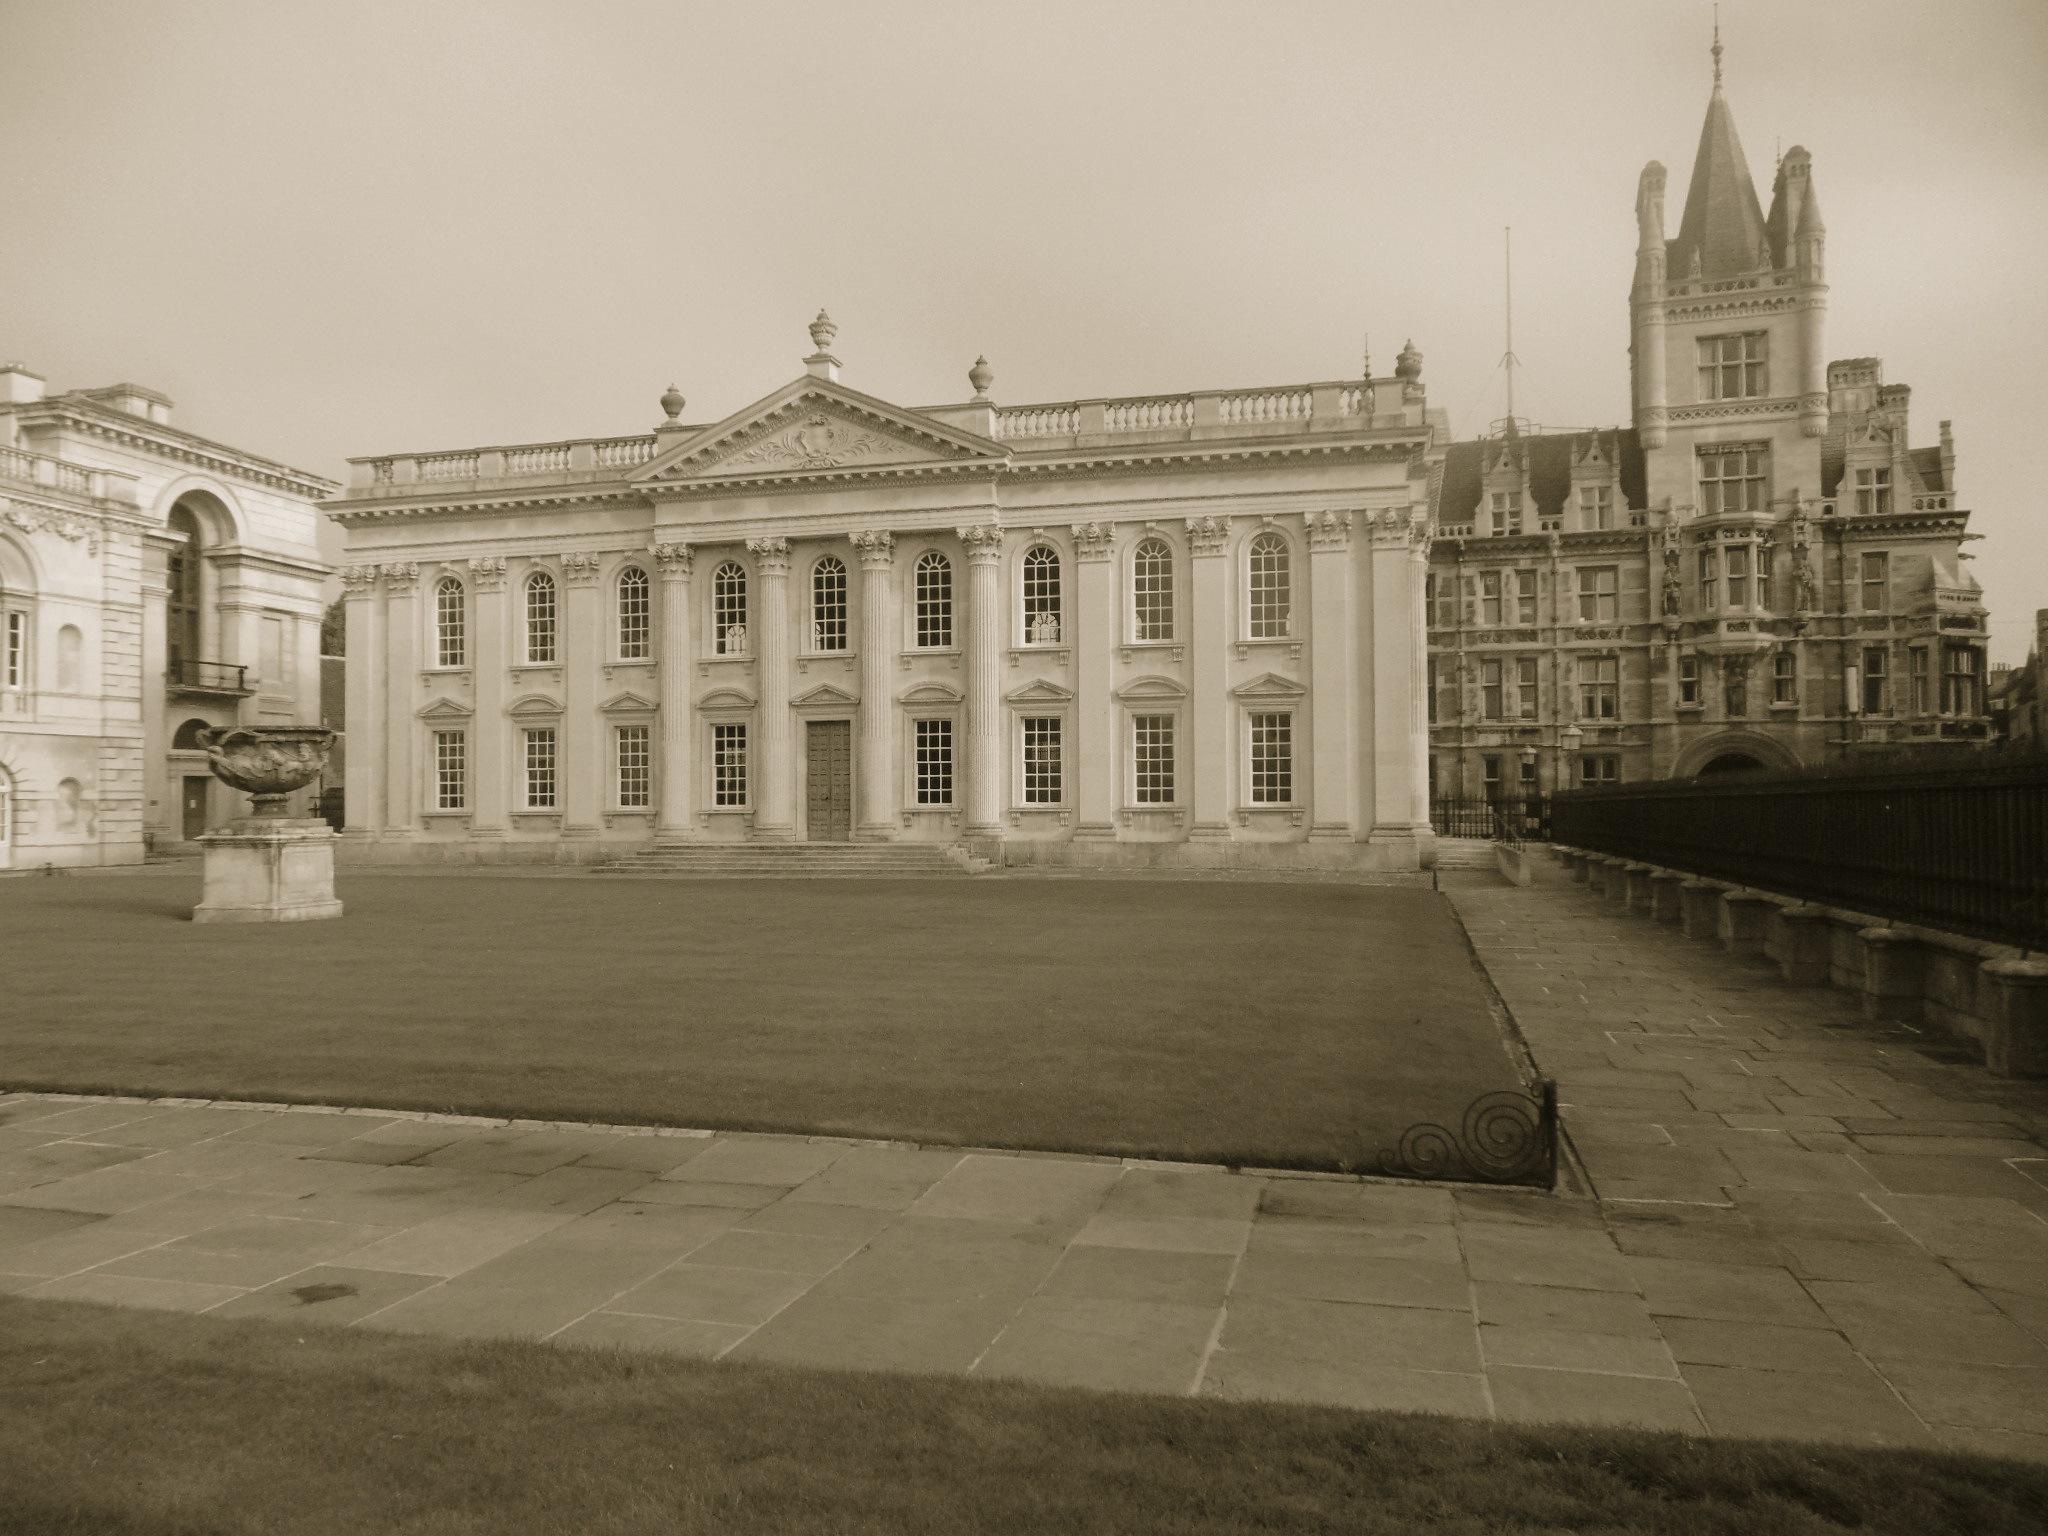 The Senate House by Simon Hill